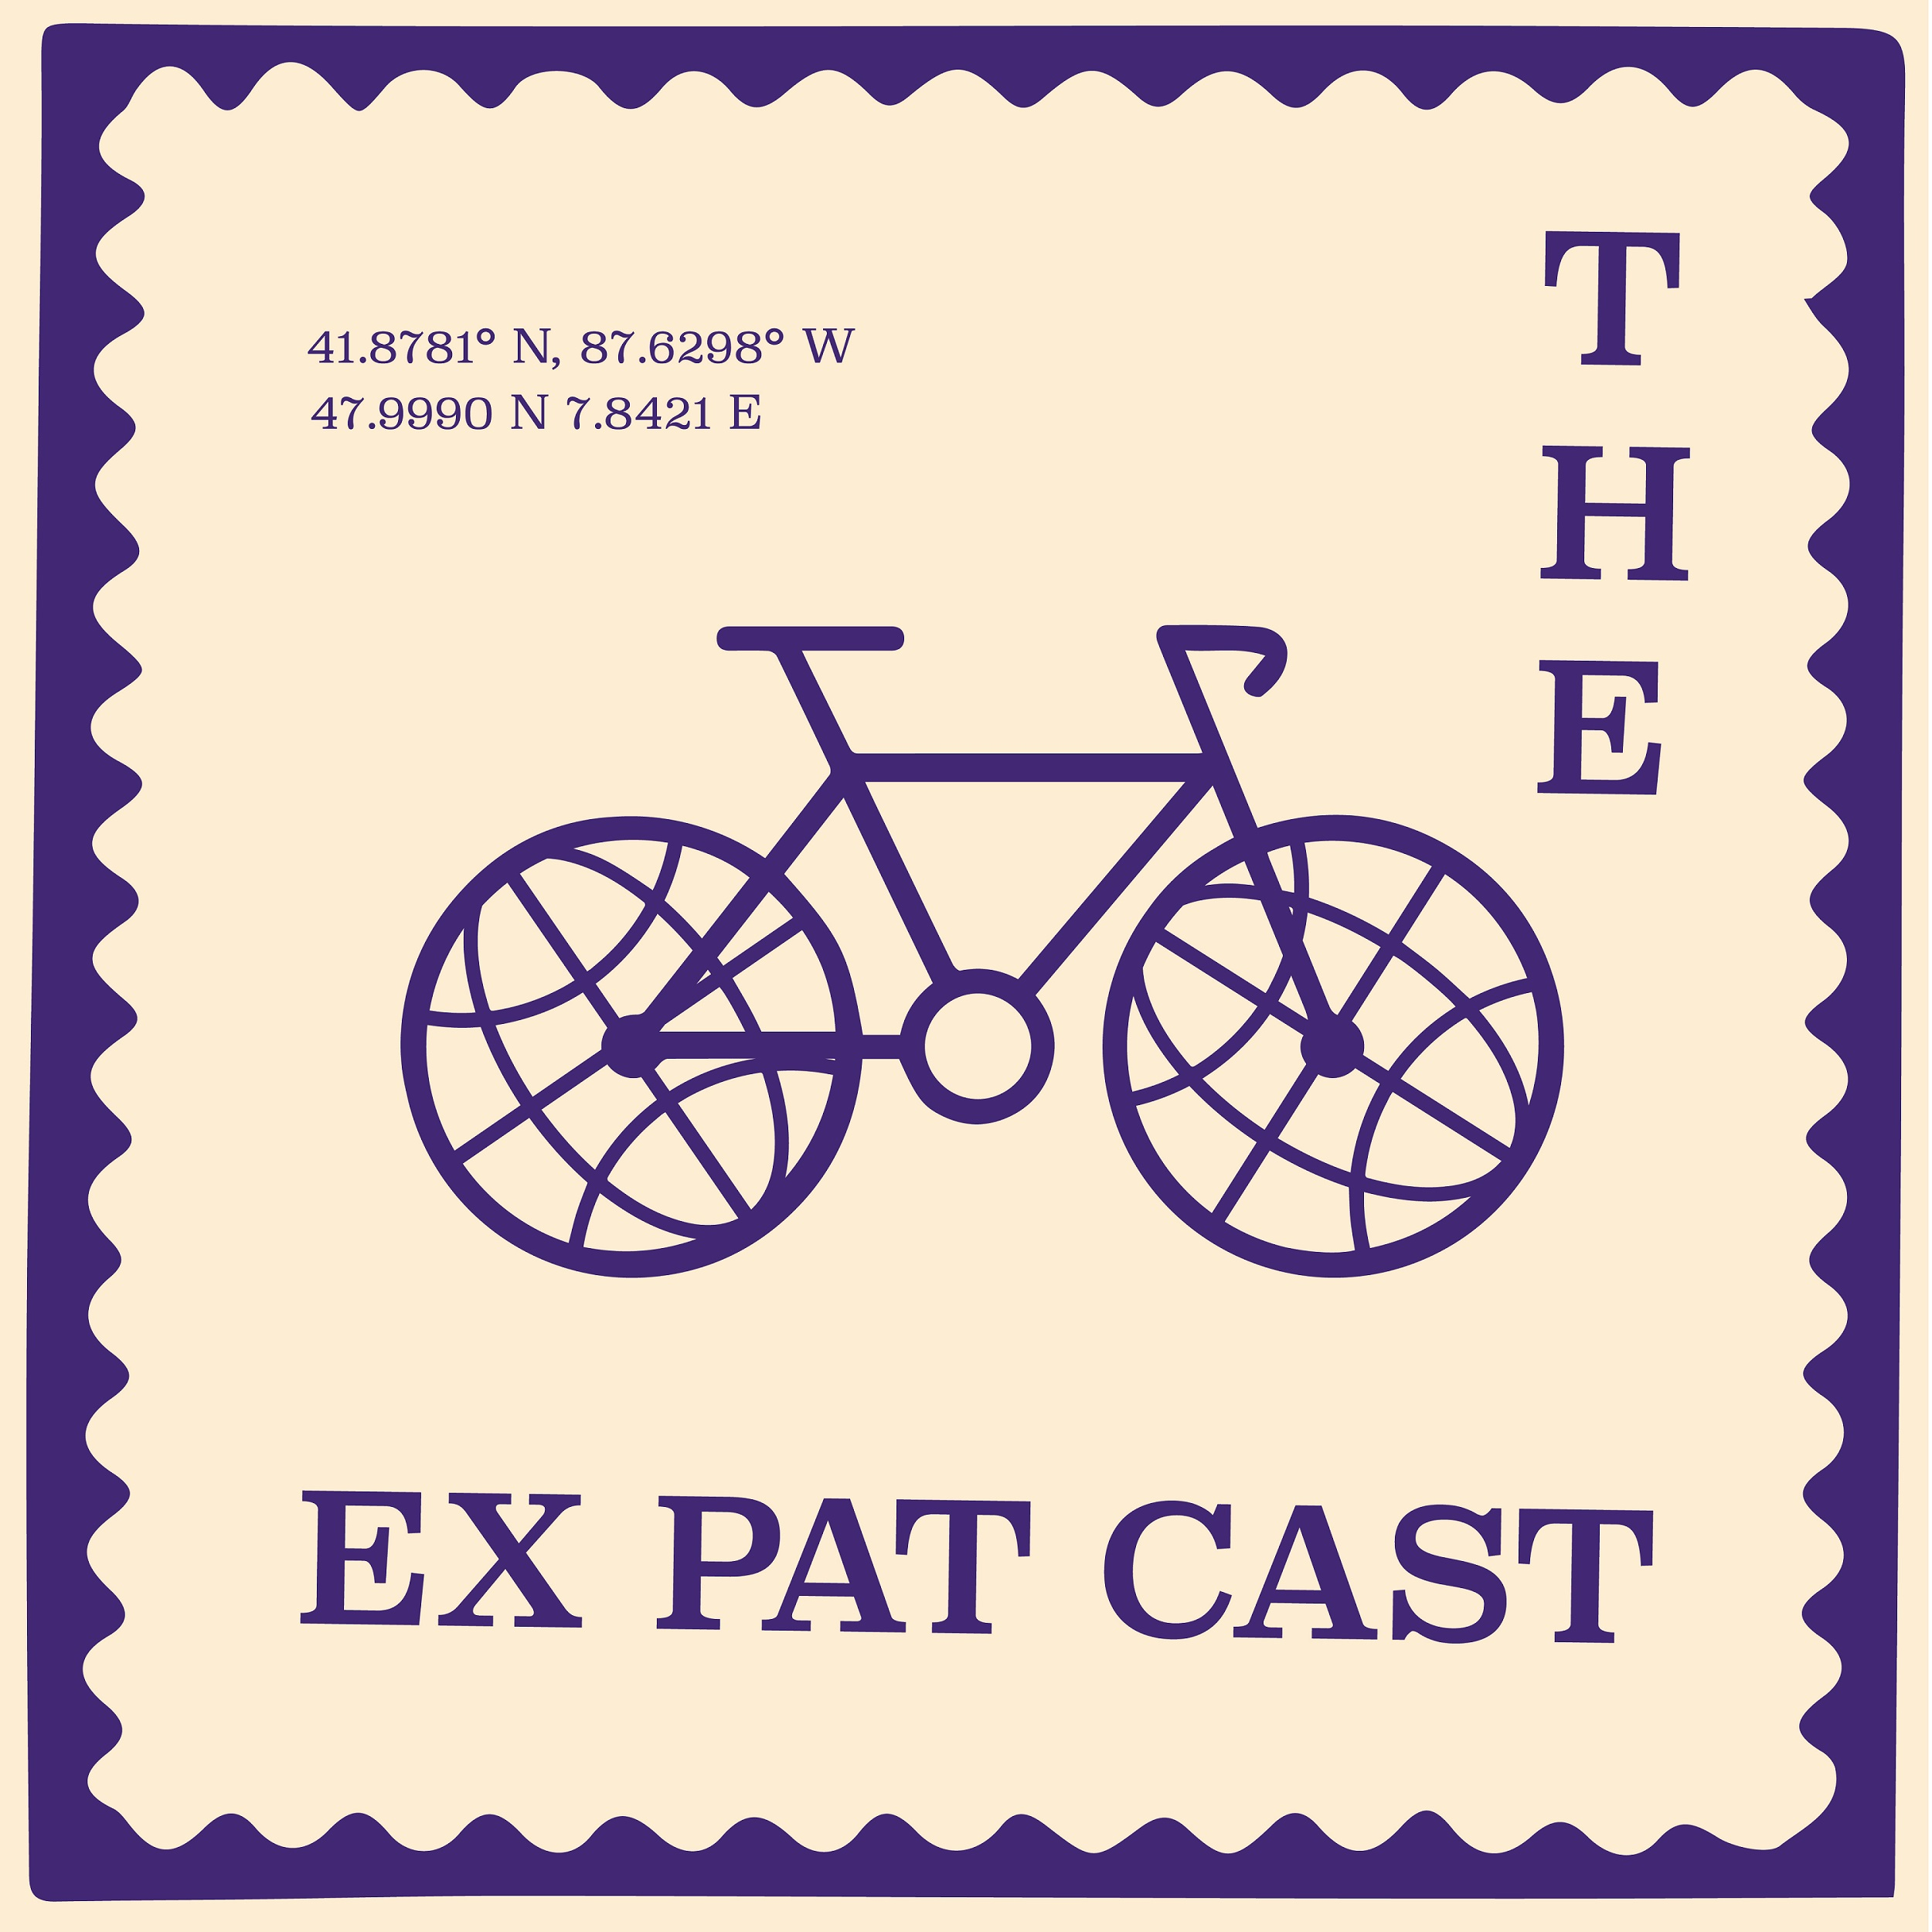 ExPatCast_Logo_Coordinates_Medium.jpg